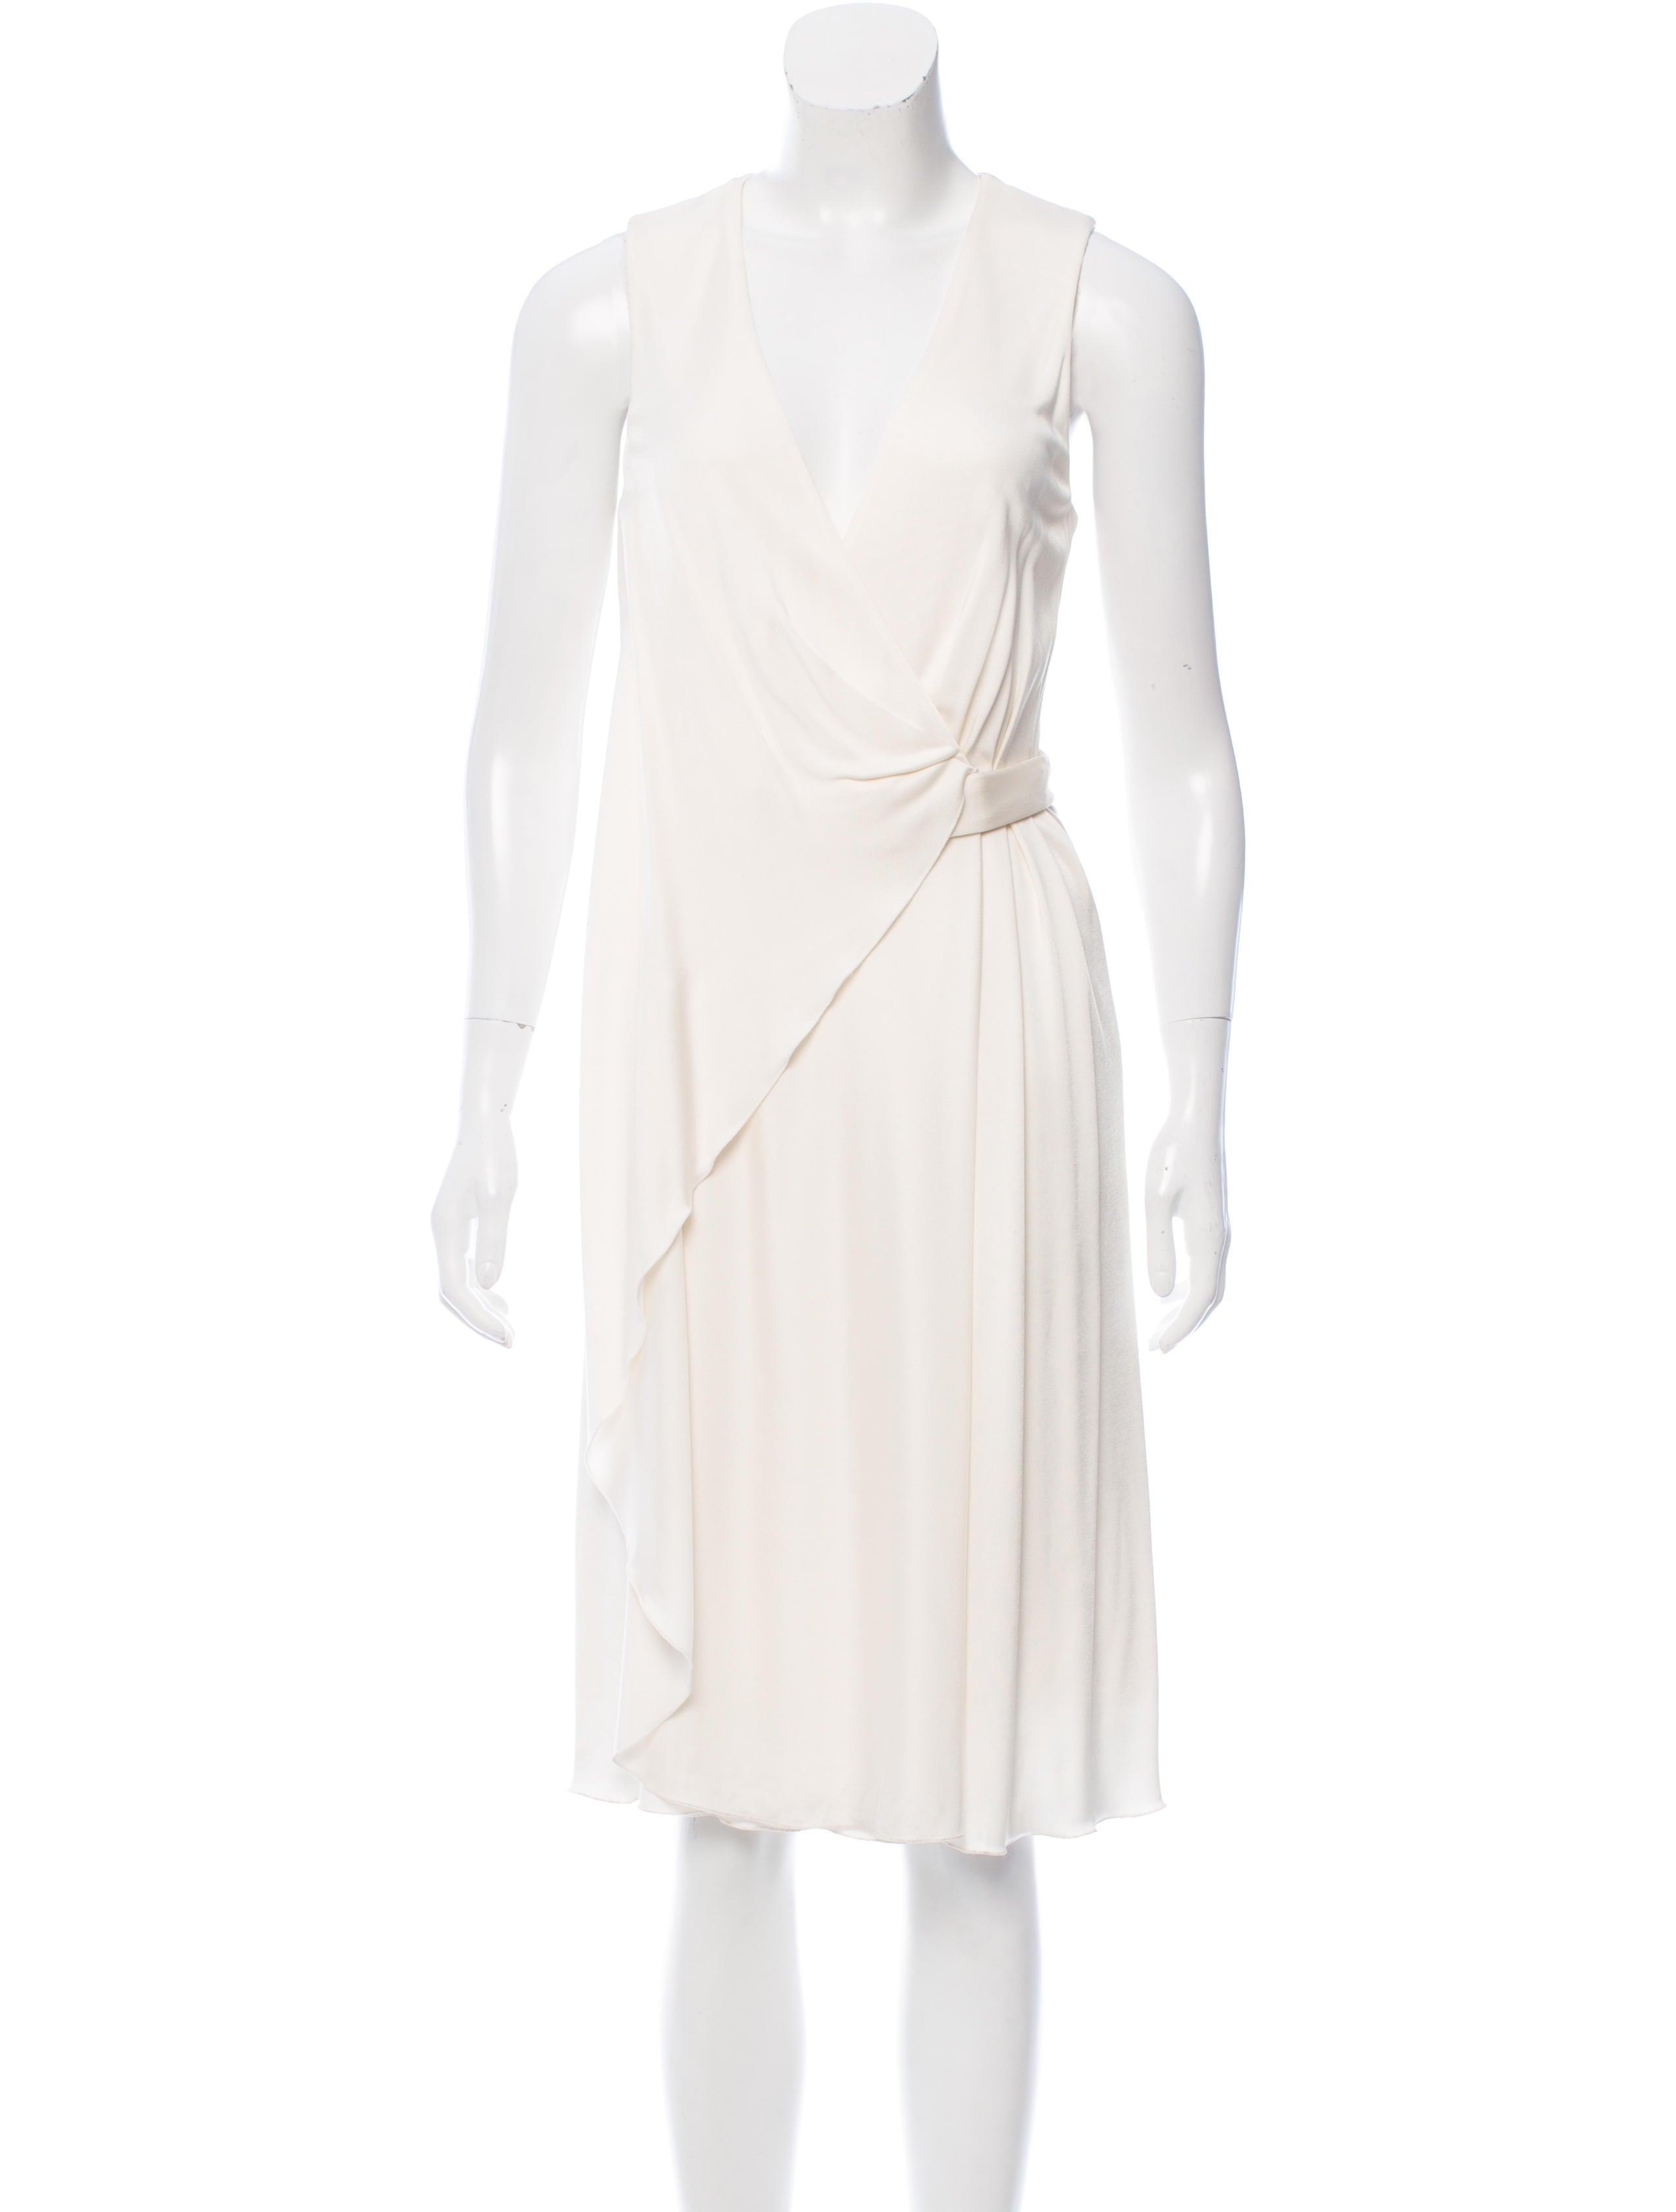 Alexander wang sleeveless midi dress w tags clothing for Alexander wang wedding dresses